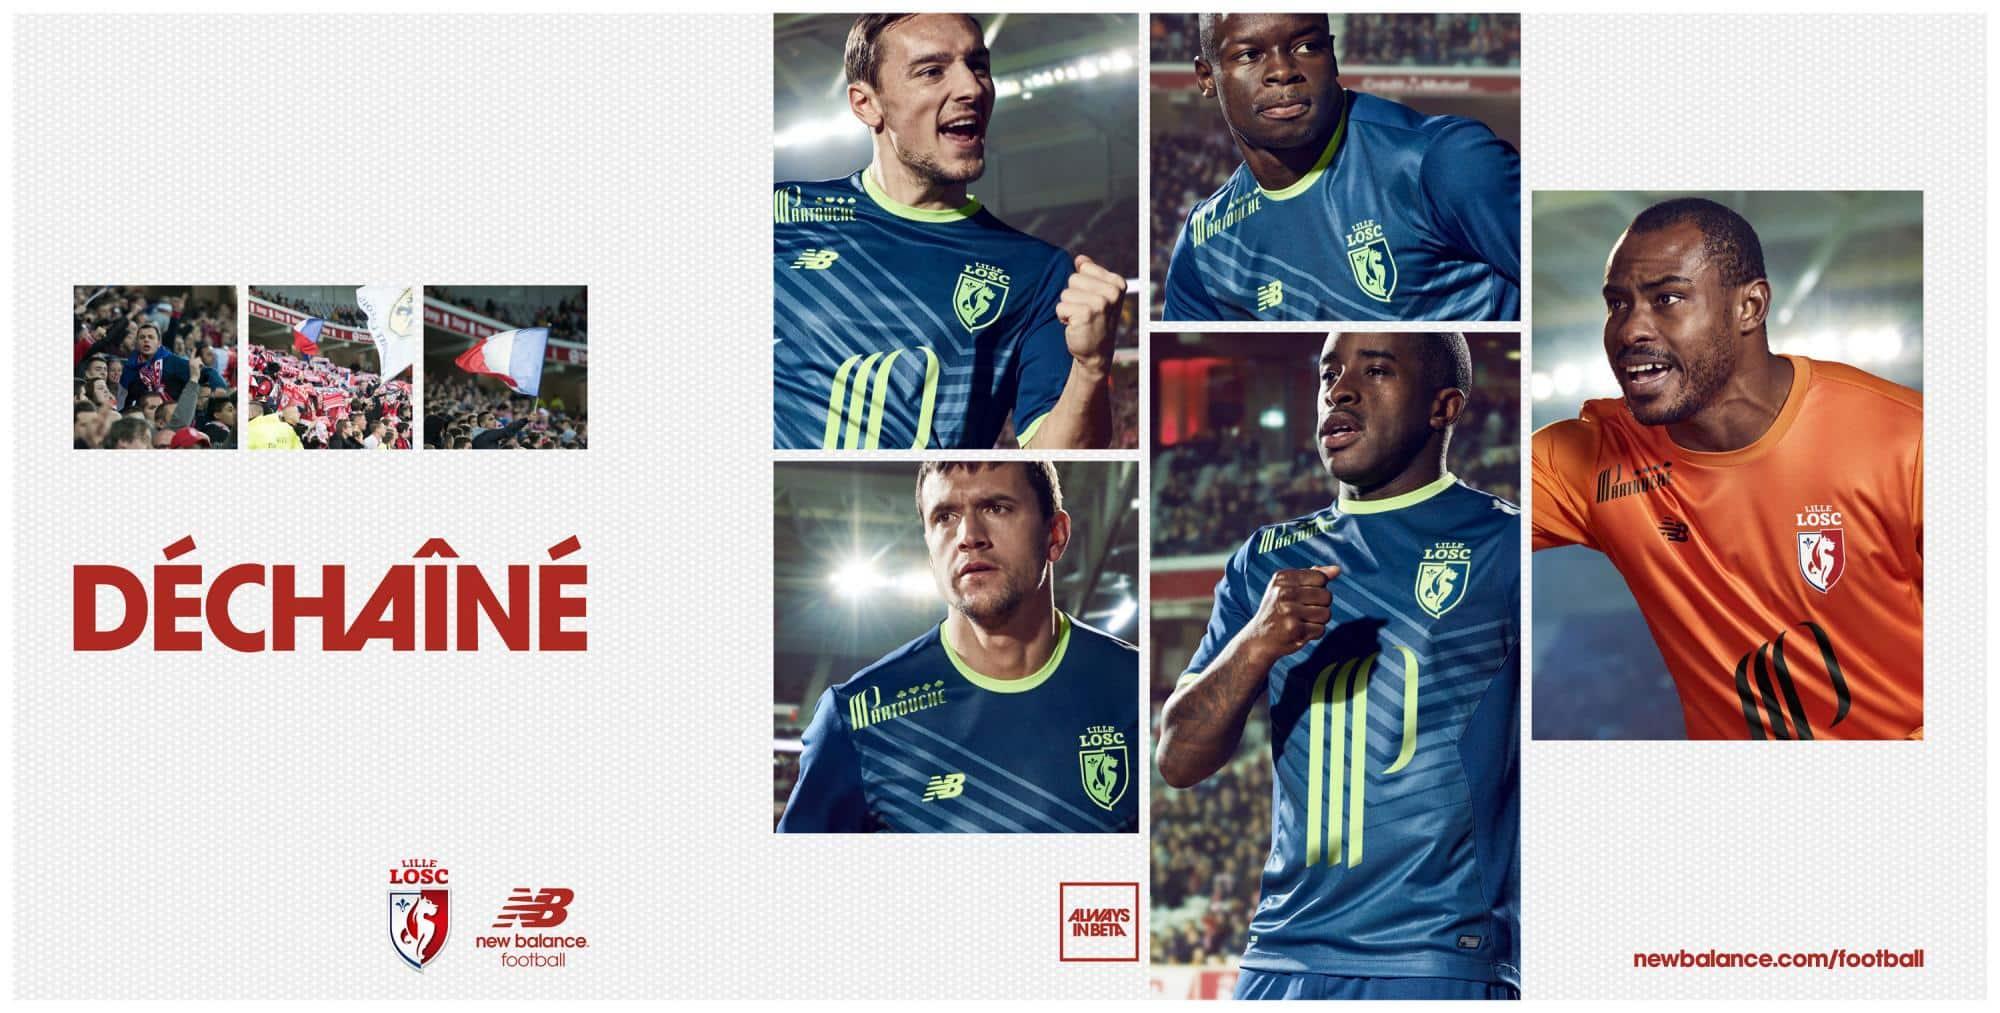 maillot-third-lille-2016-2017-new-balance